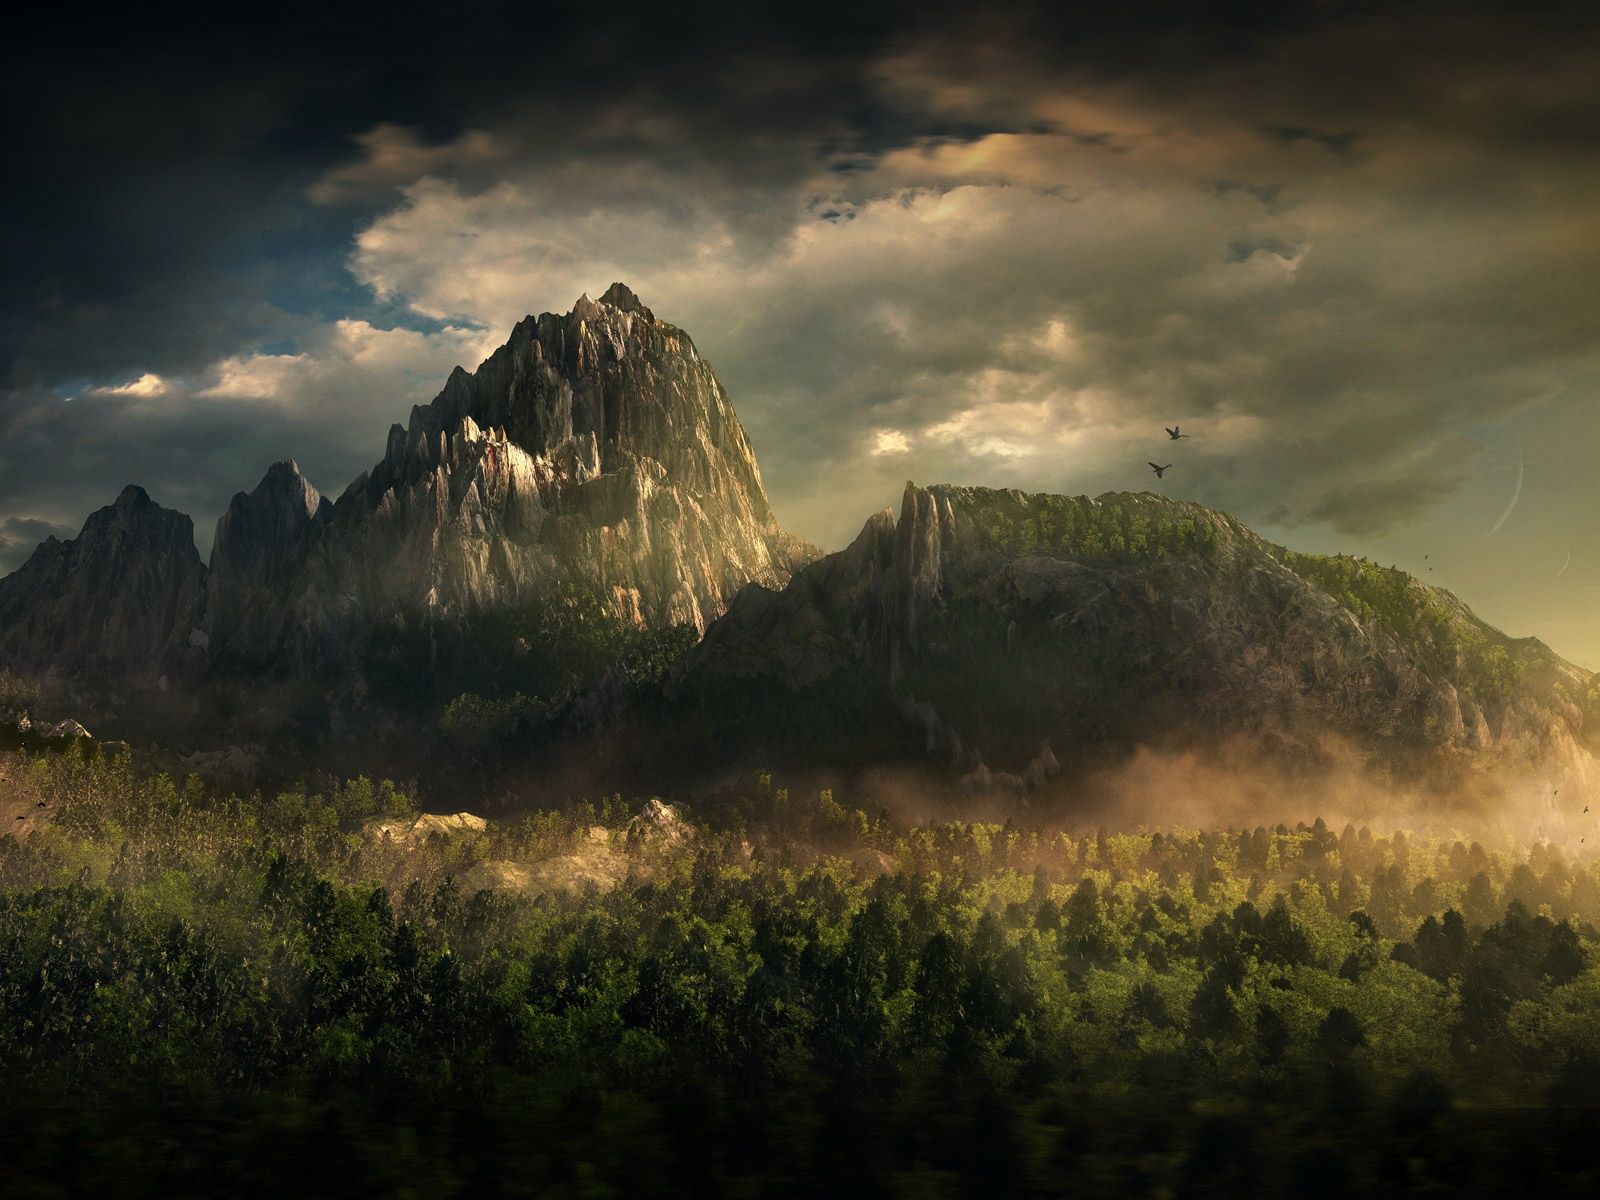 l'enrichissement d'un nain 5586-montagne-fantastique-WallFizz